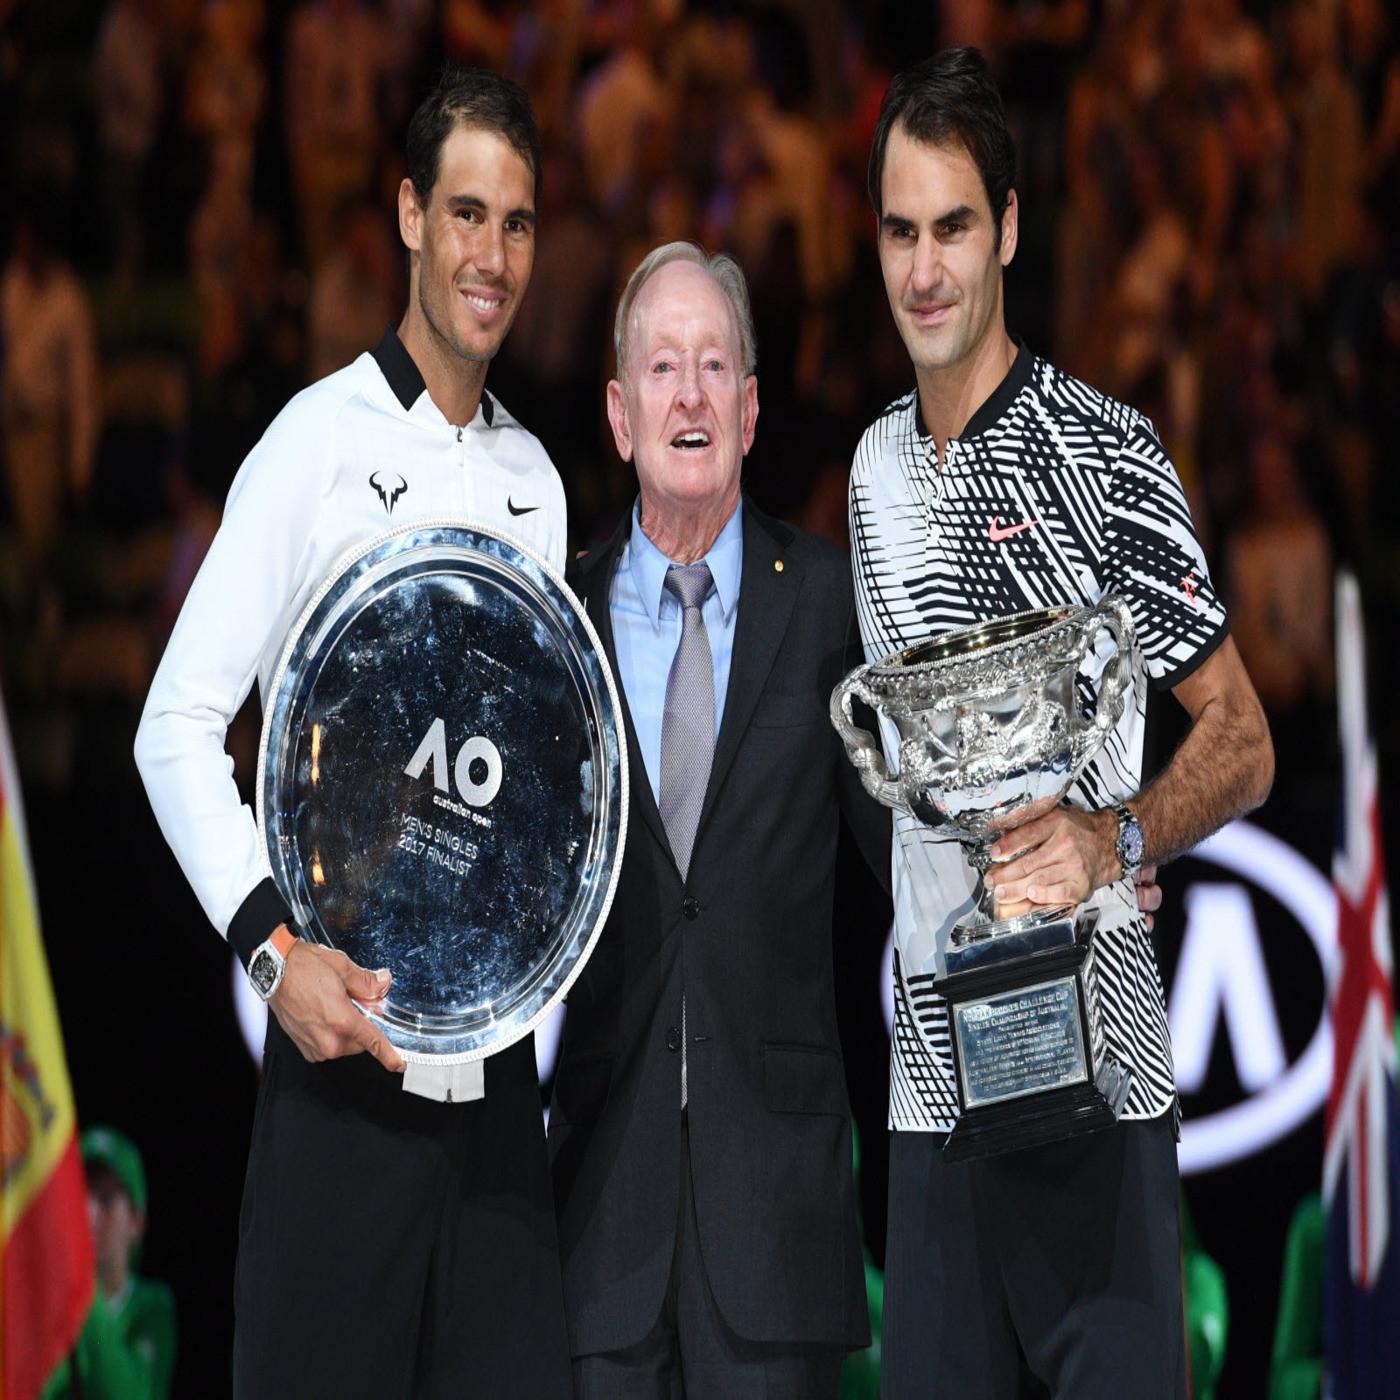 Open d'Australie 2017: Un match de légende